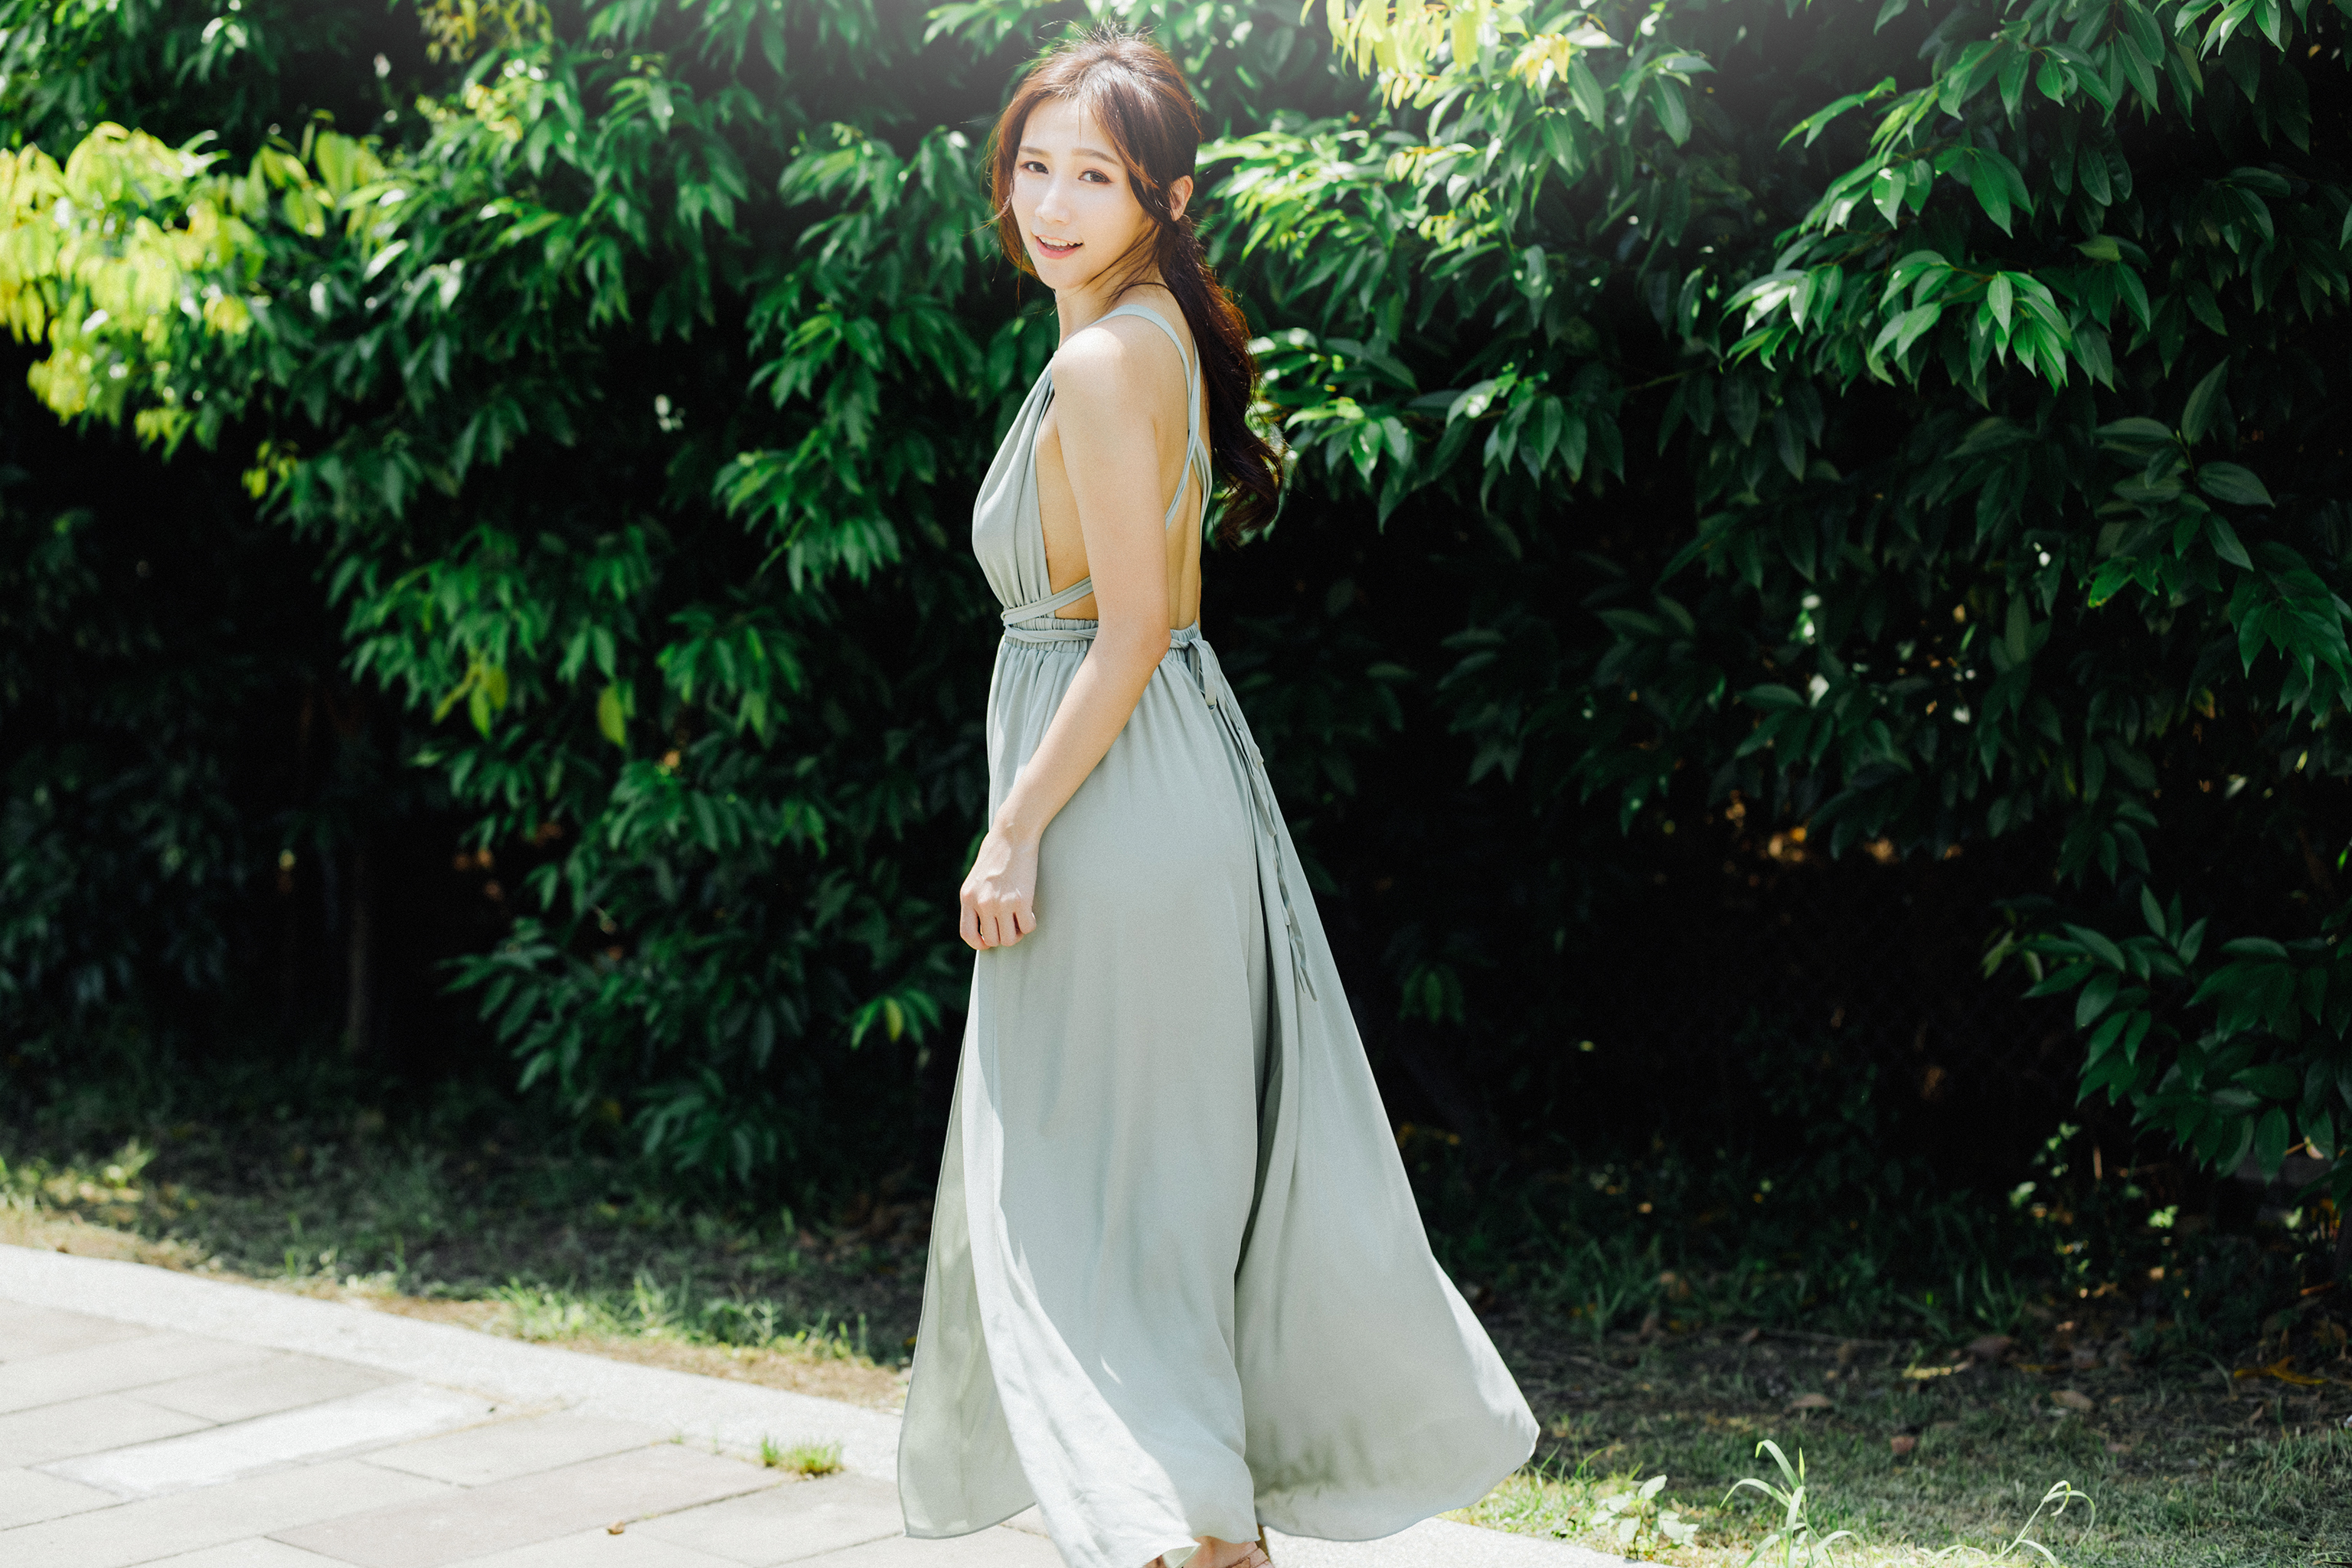 48592181646 be312a978a o - 【自主婚紗】+Ying&Wiwi+